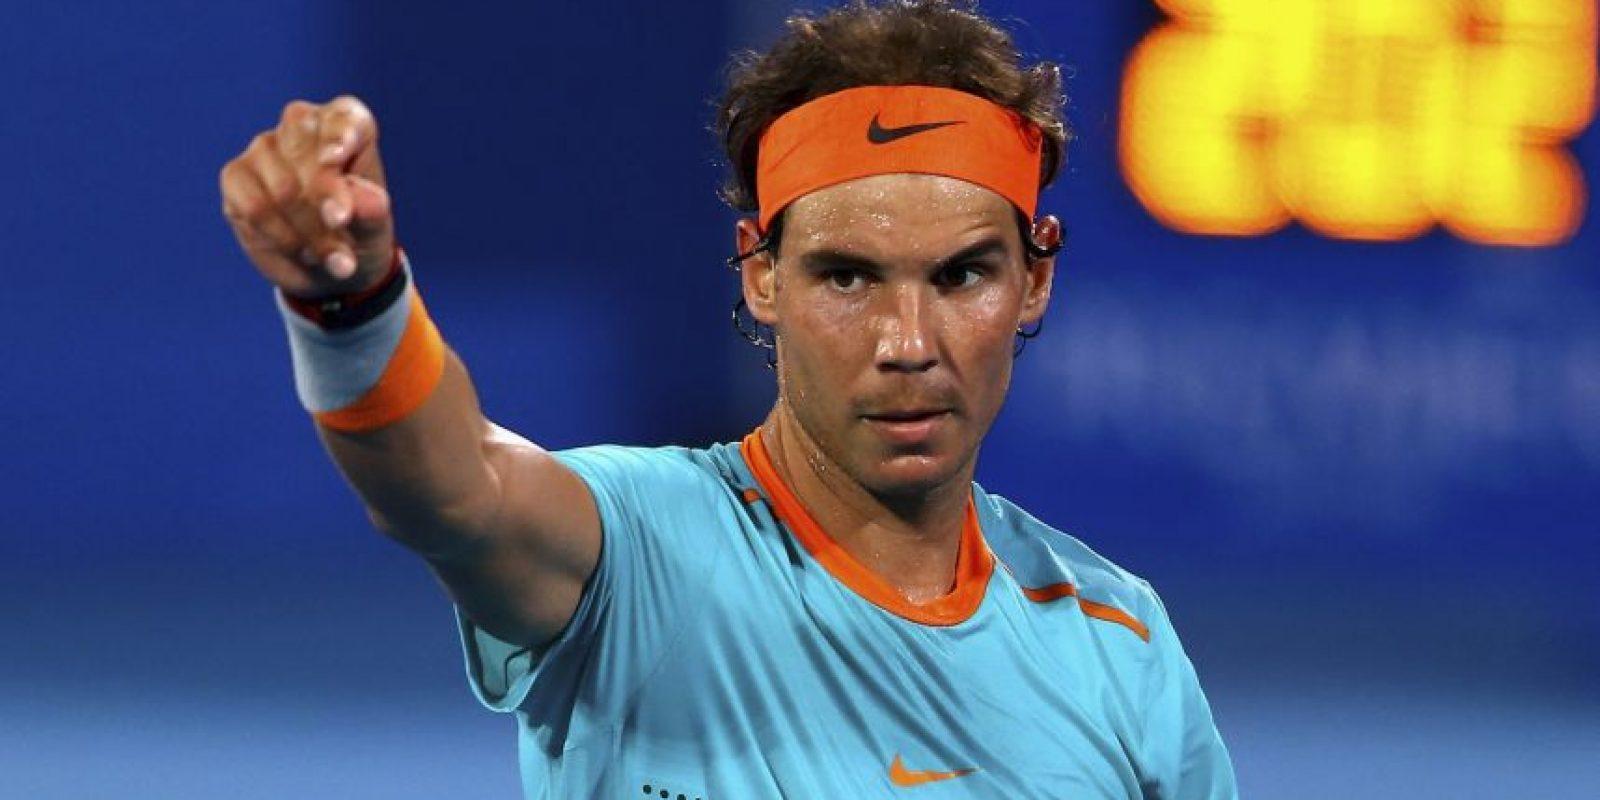 9. Rafael Nadal @RafaelNadal (Tenis/España): 45 mil 280 dólares por tuit. Foto:Getty Images